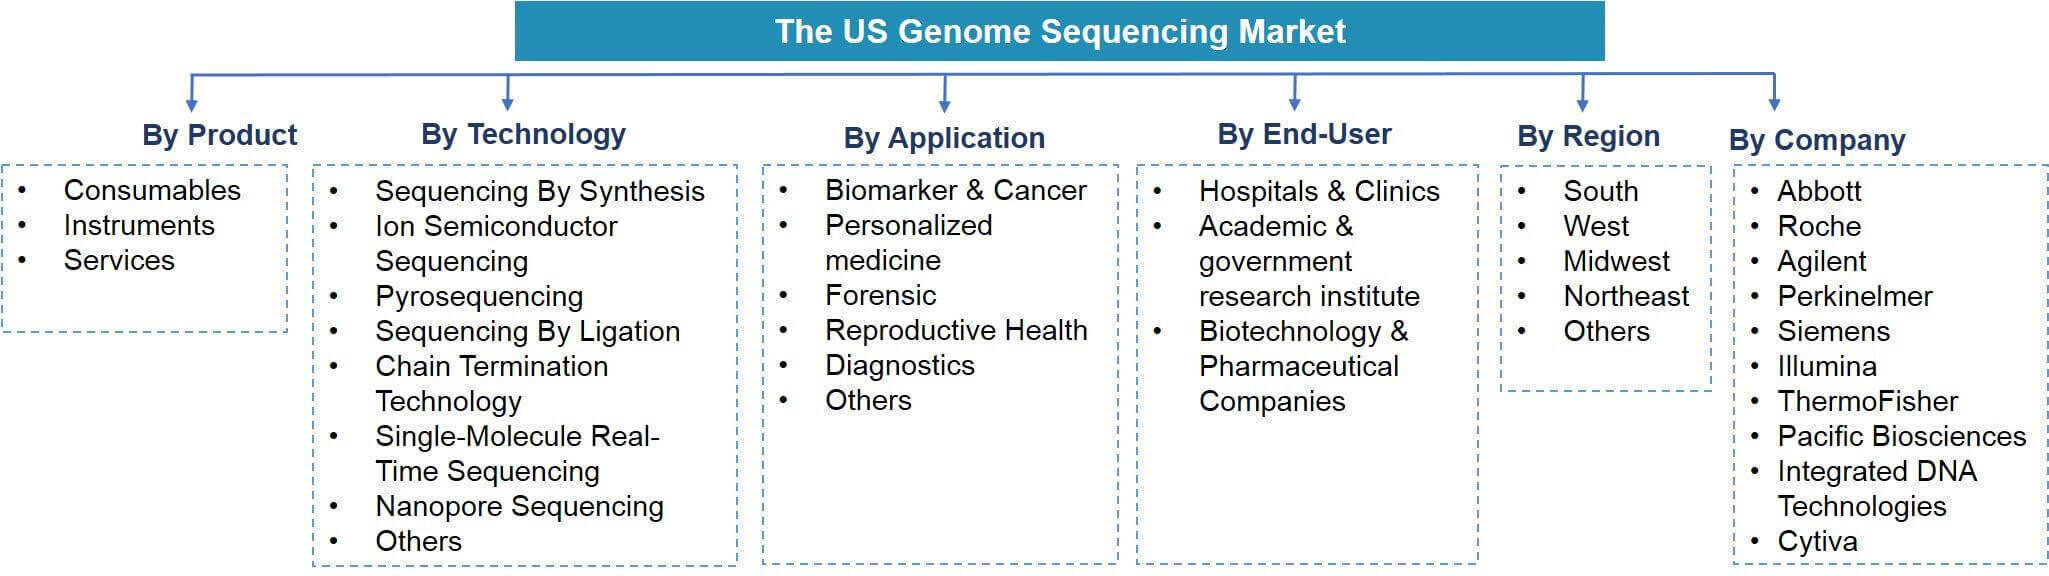 USA Genome Sequencing Market Segmentation